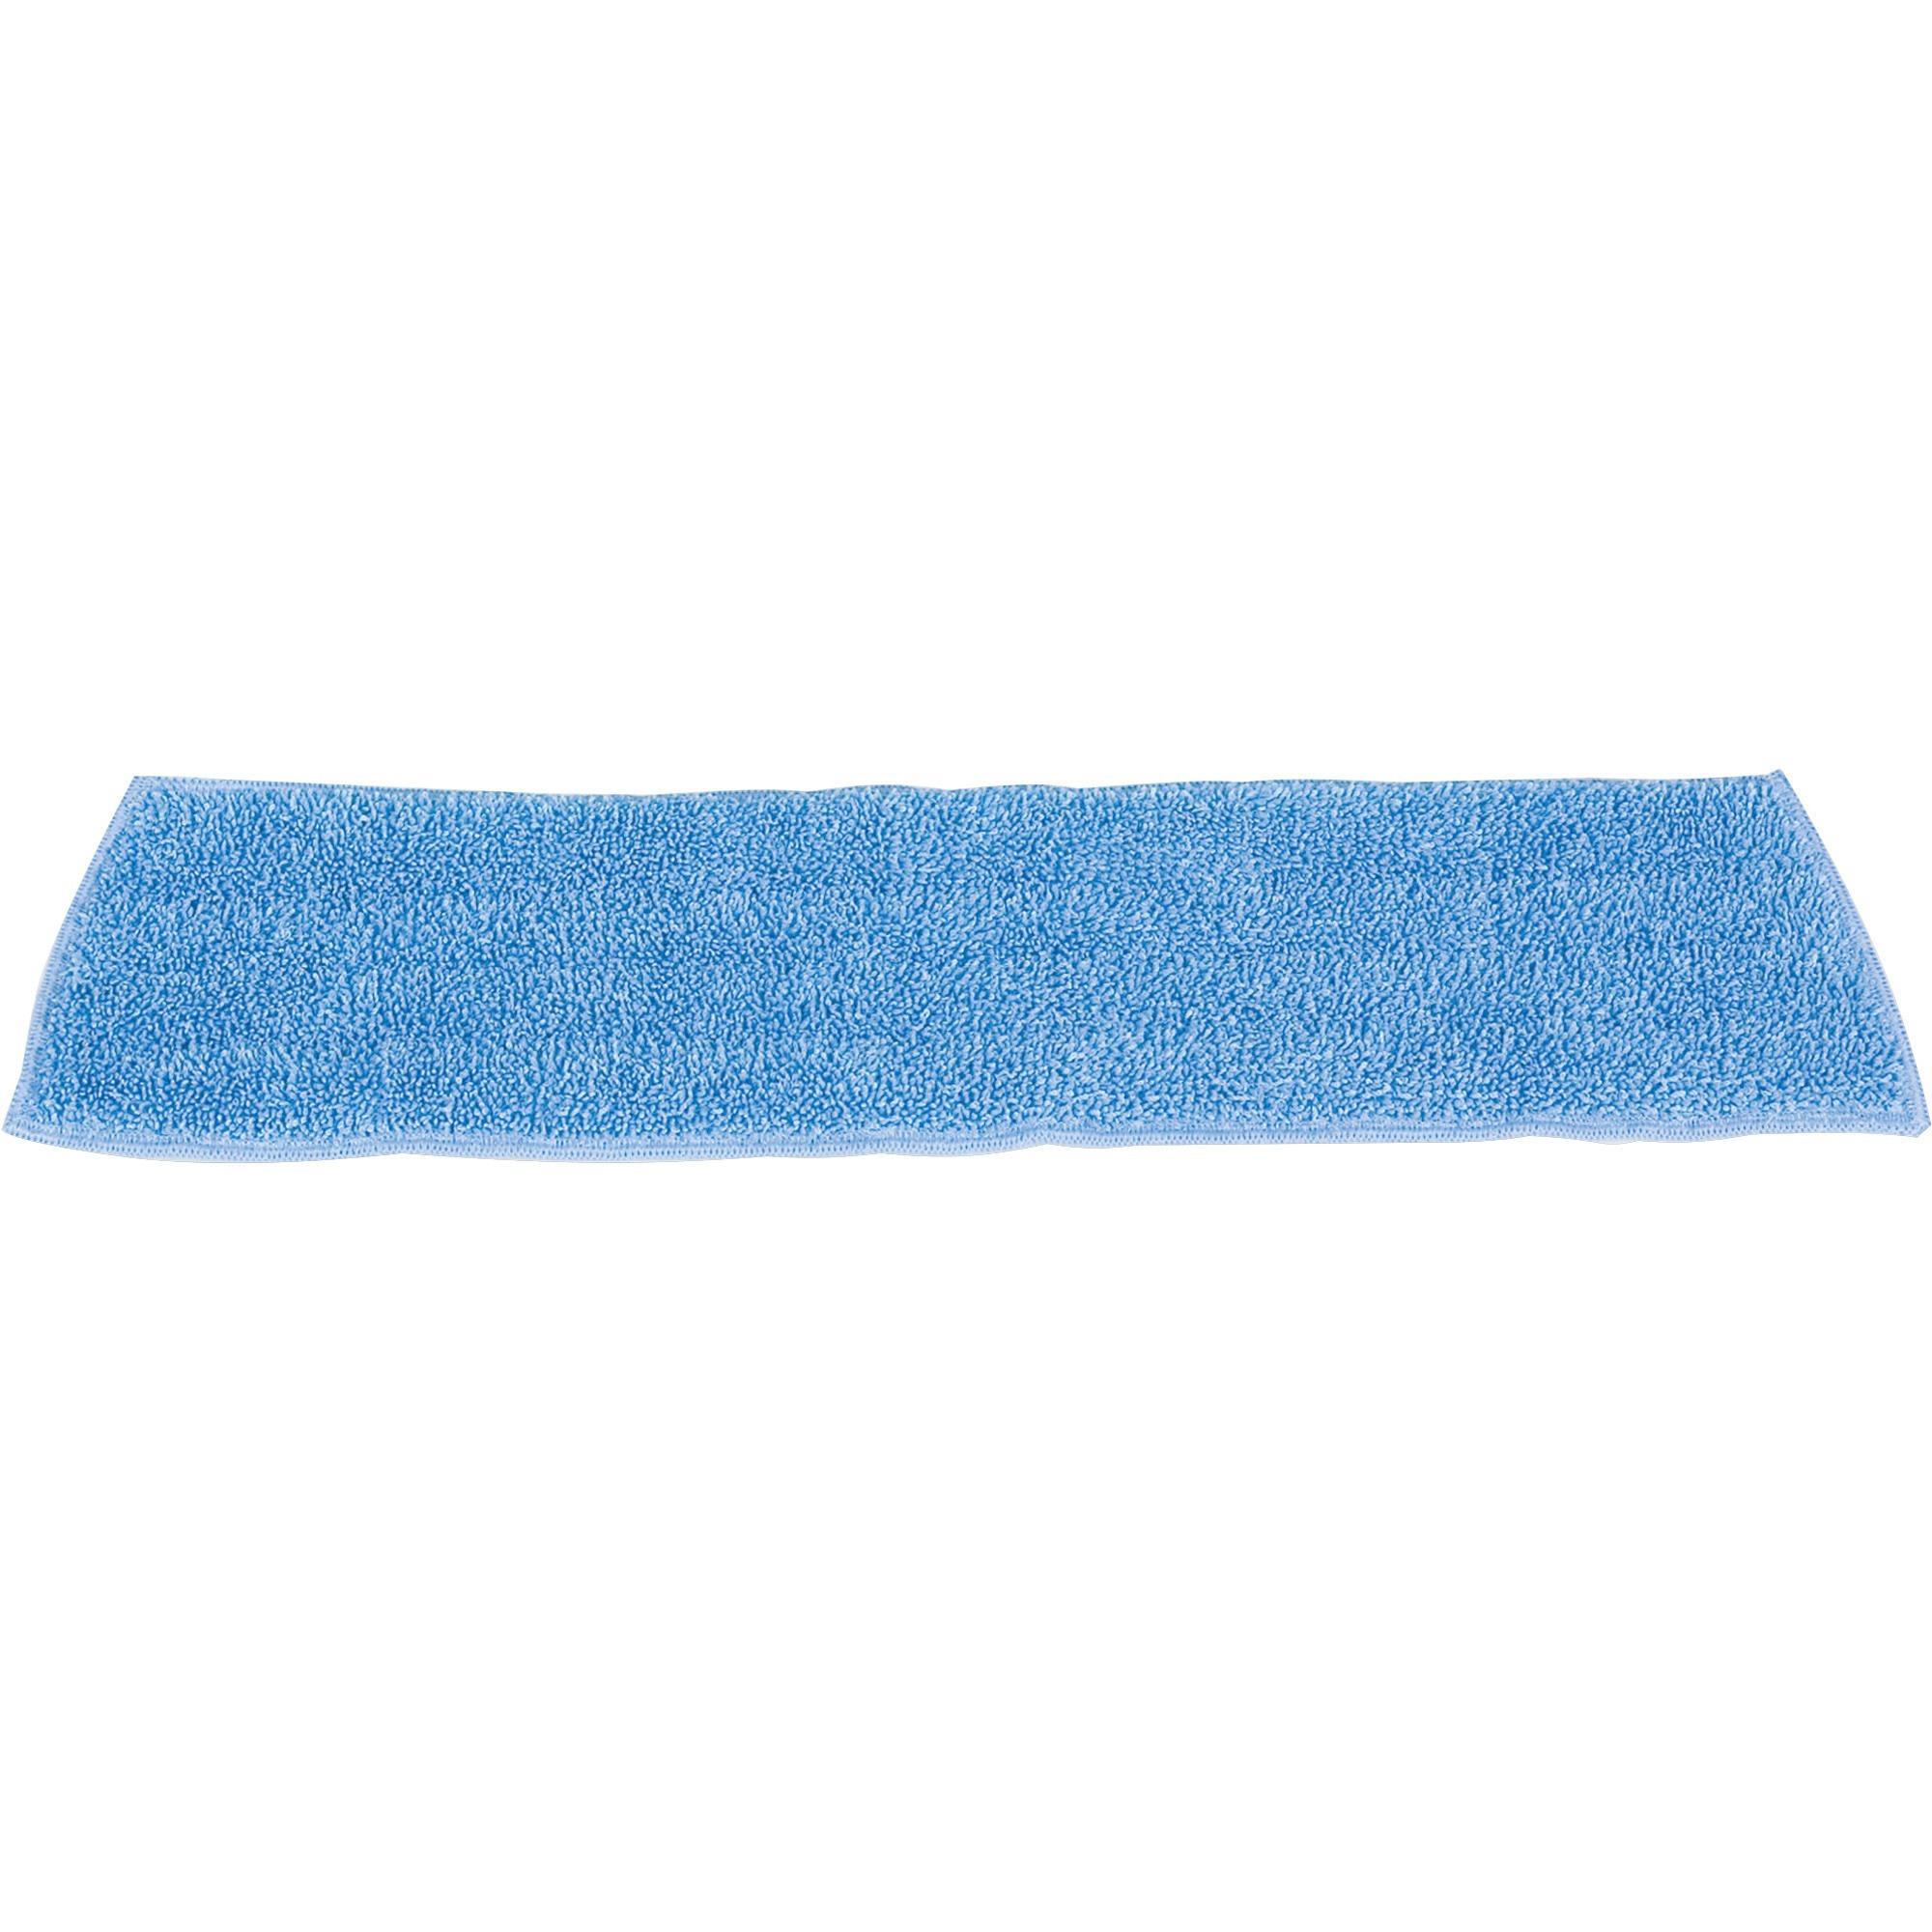 "Economy Wet Mopping Pad, Microfiber, 18"", Blue"